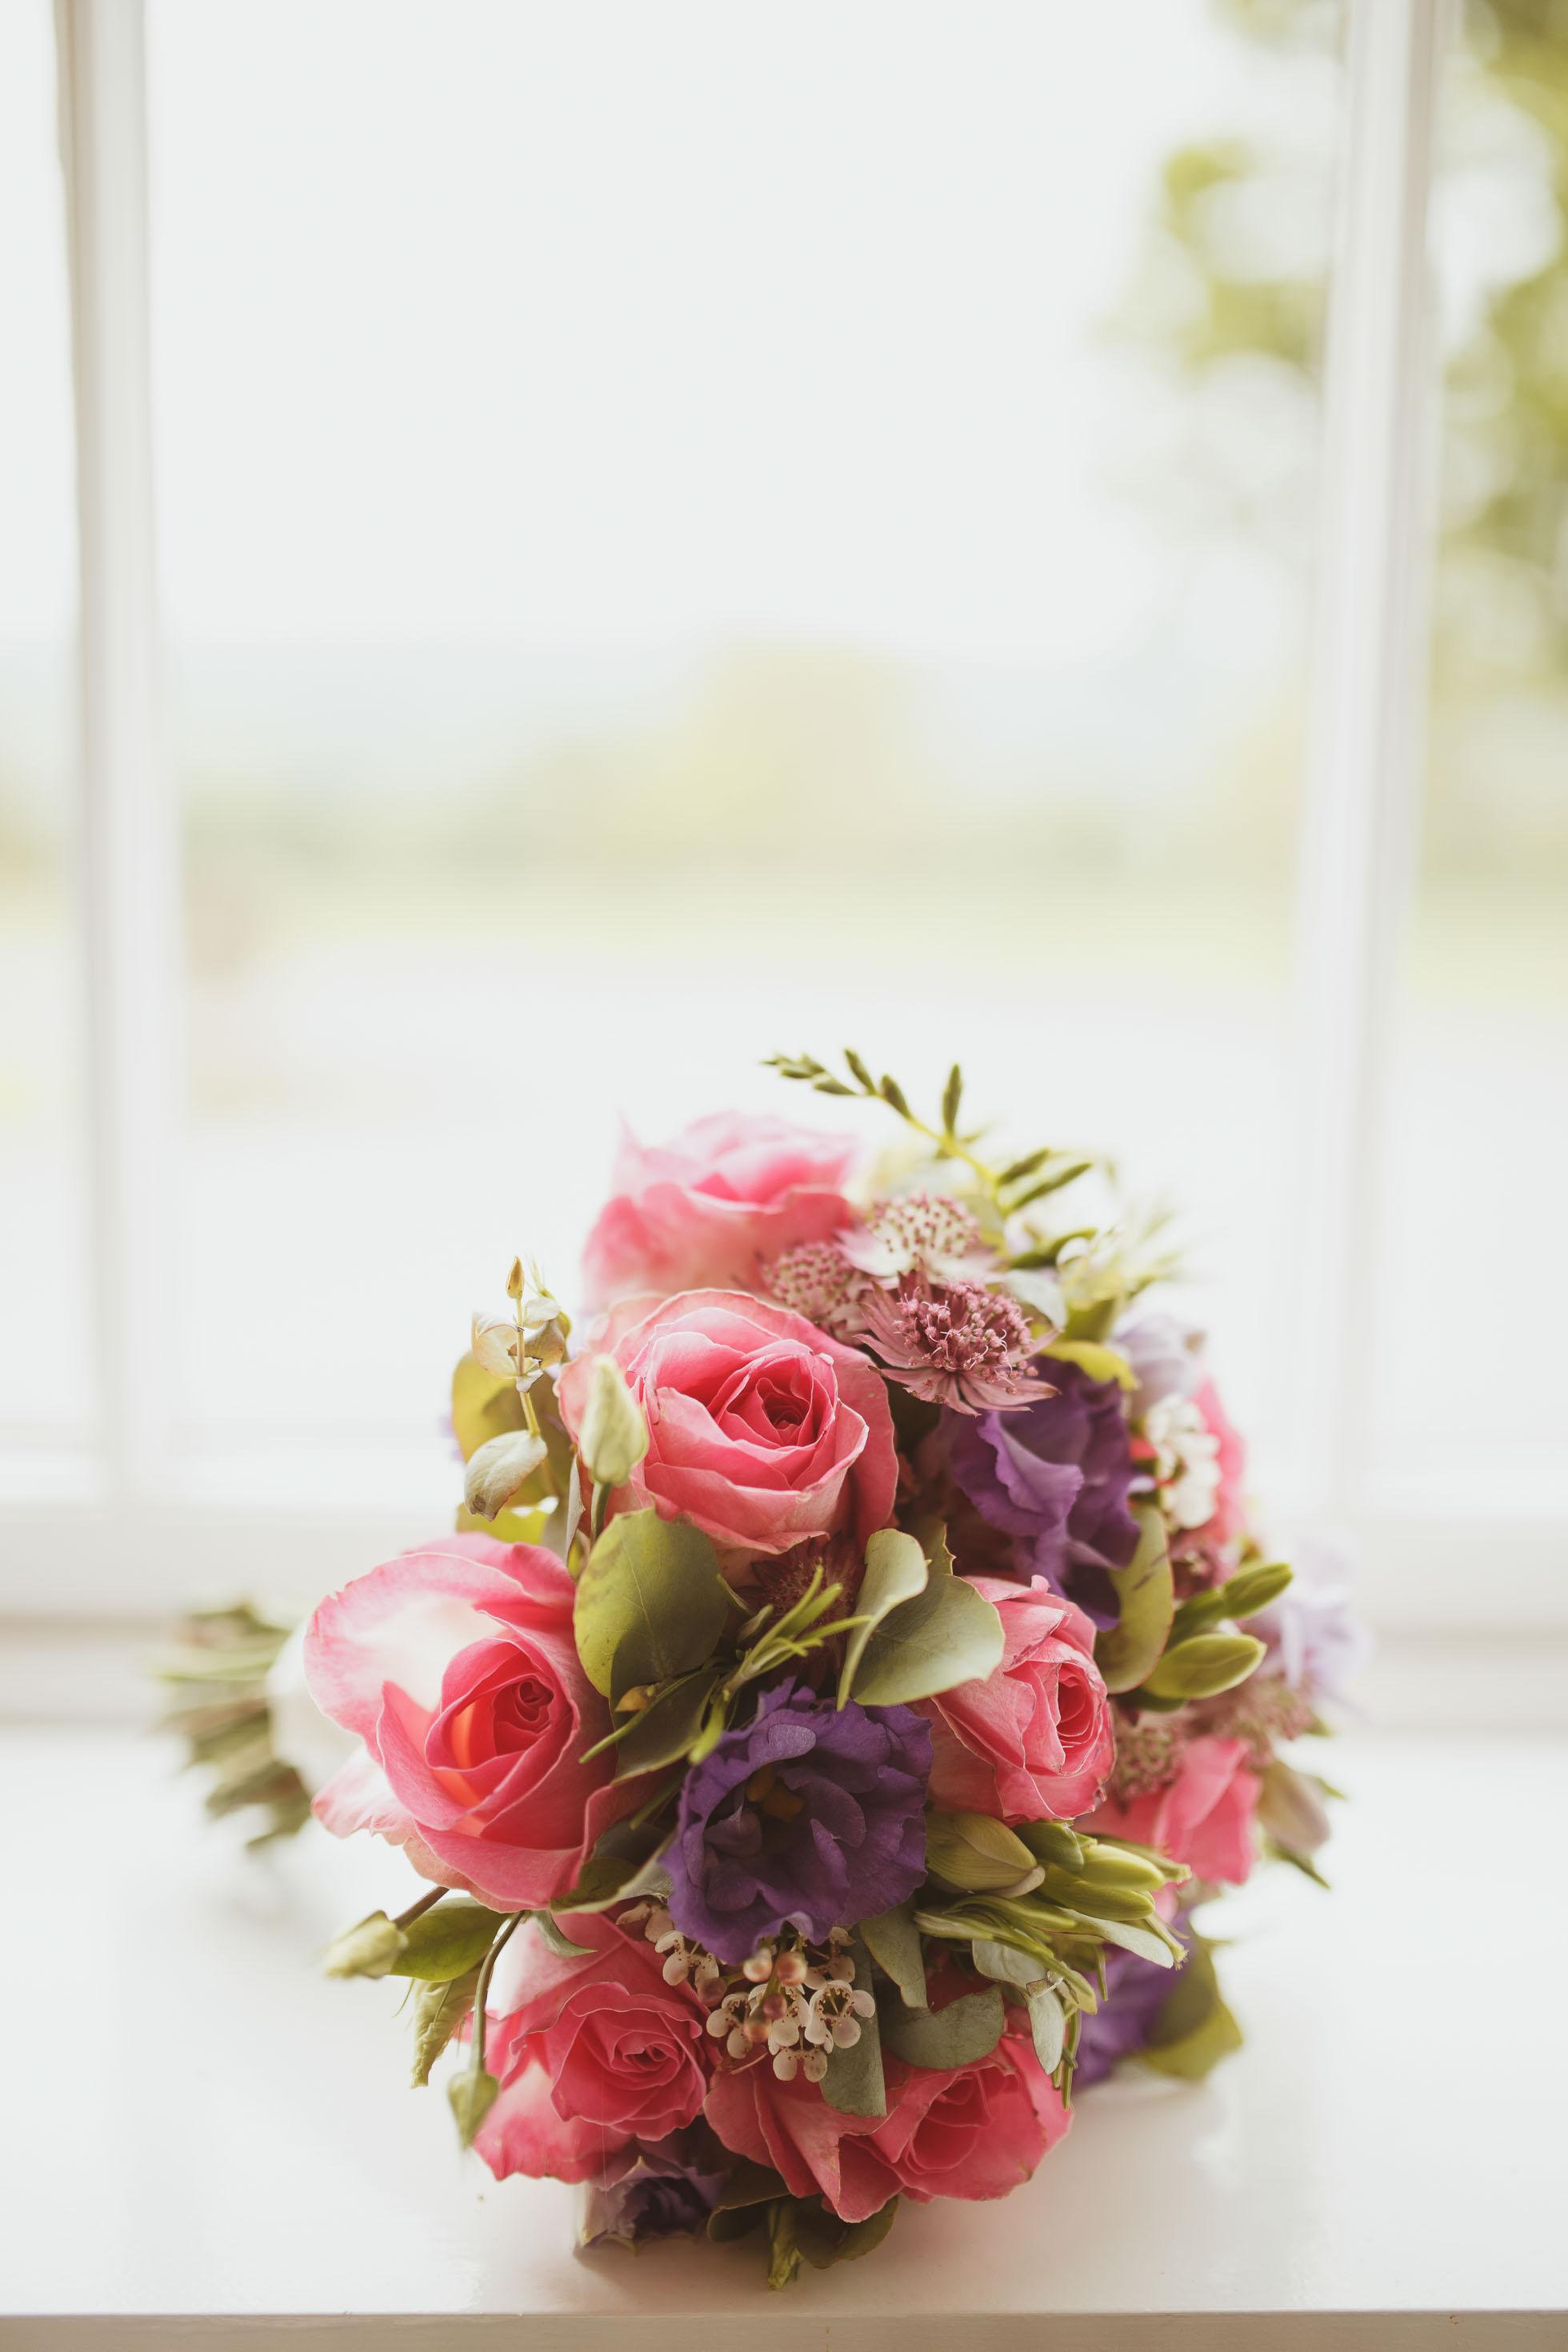 denton-hall-wedding-photographer-3.jpg